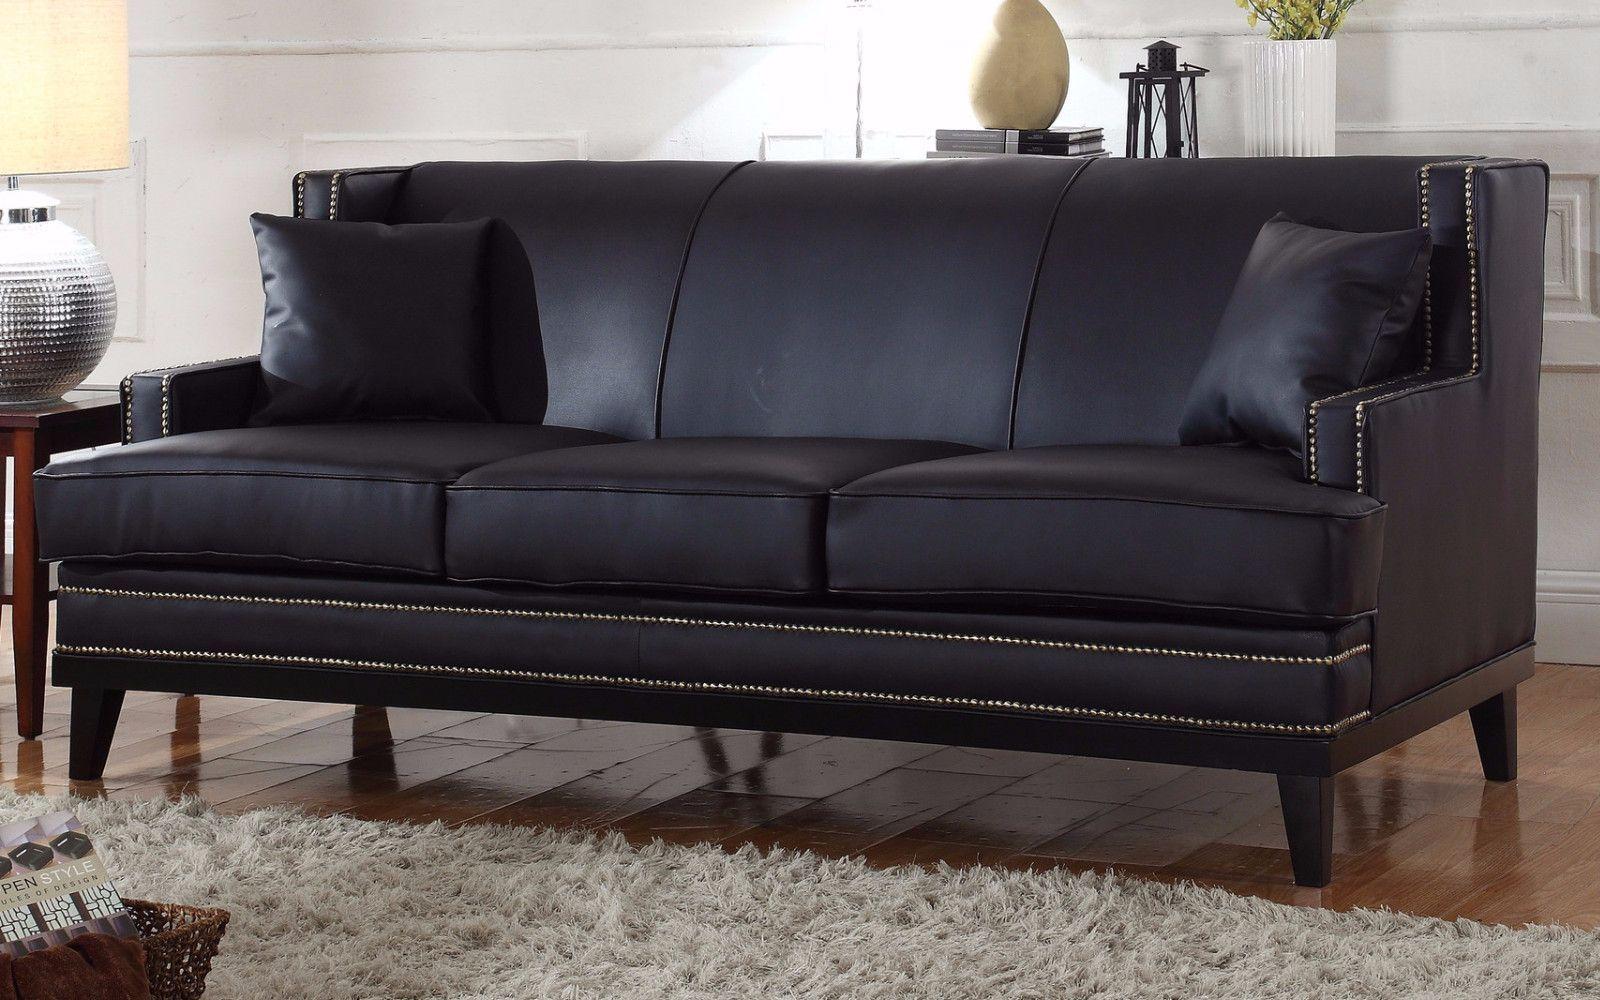 Black Leather Sofa With Nailheads Motion Martin Abe Modern Nailhead Trim Bonded Home